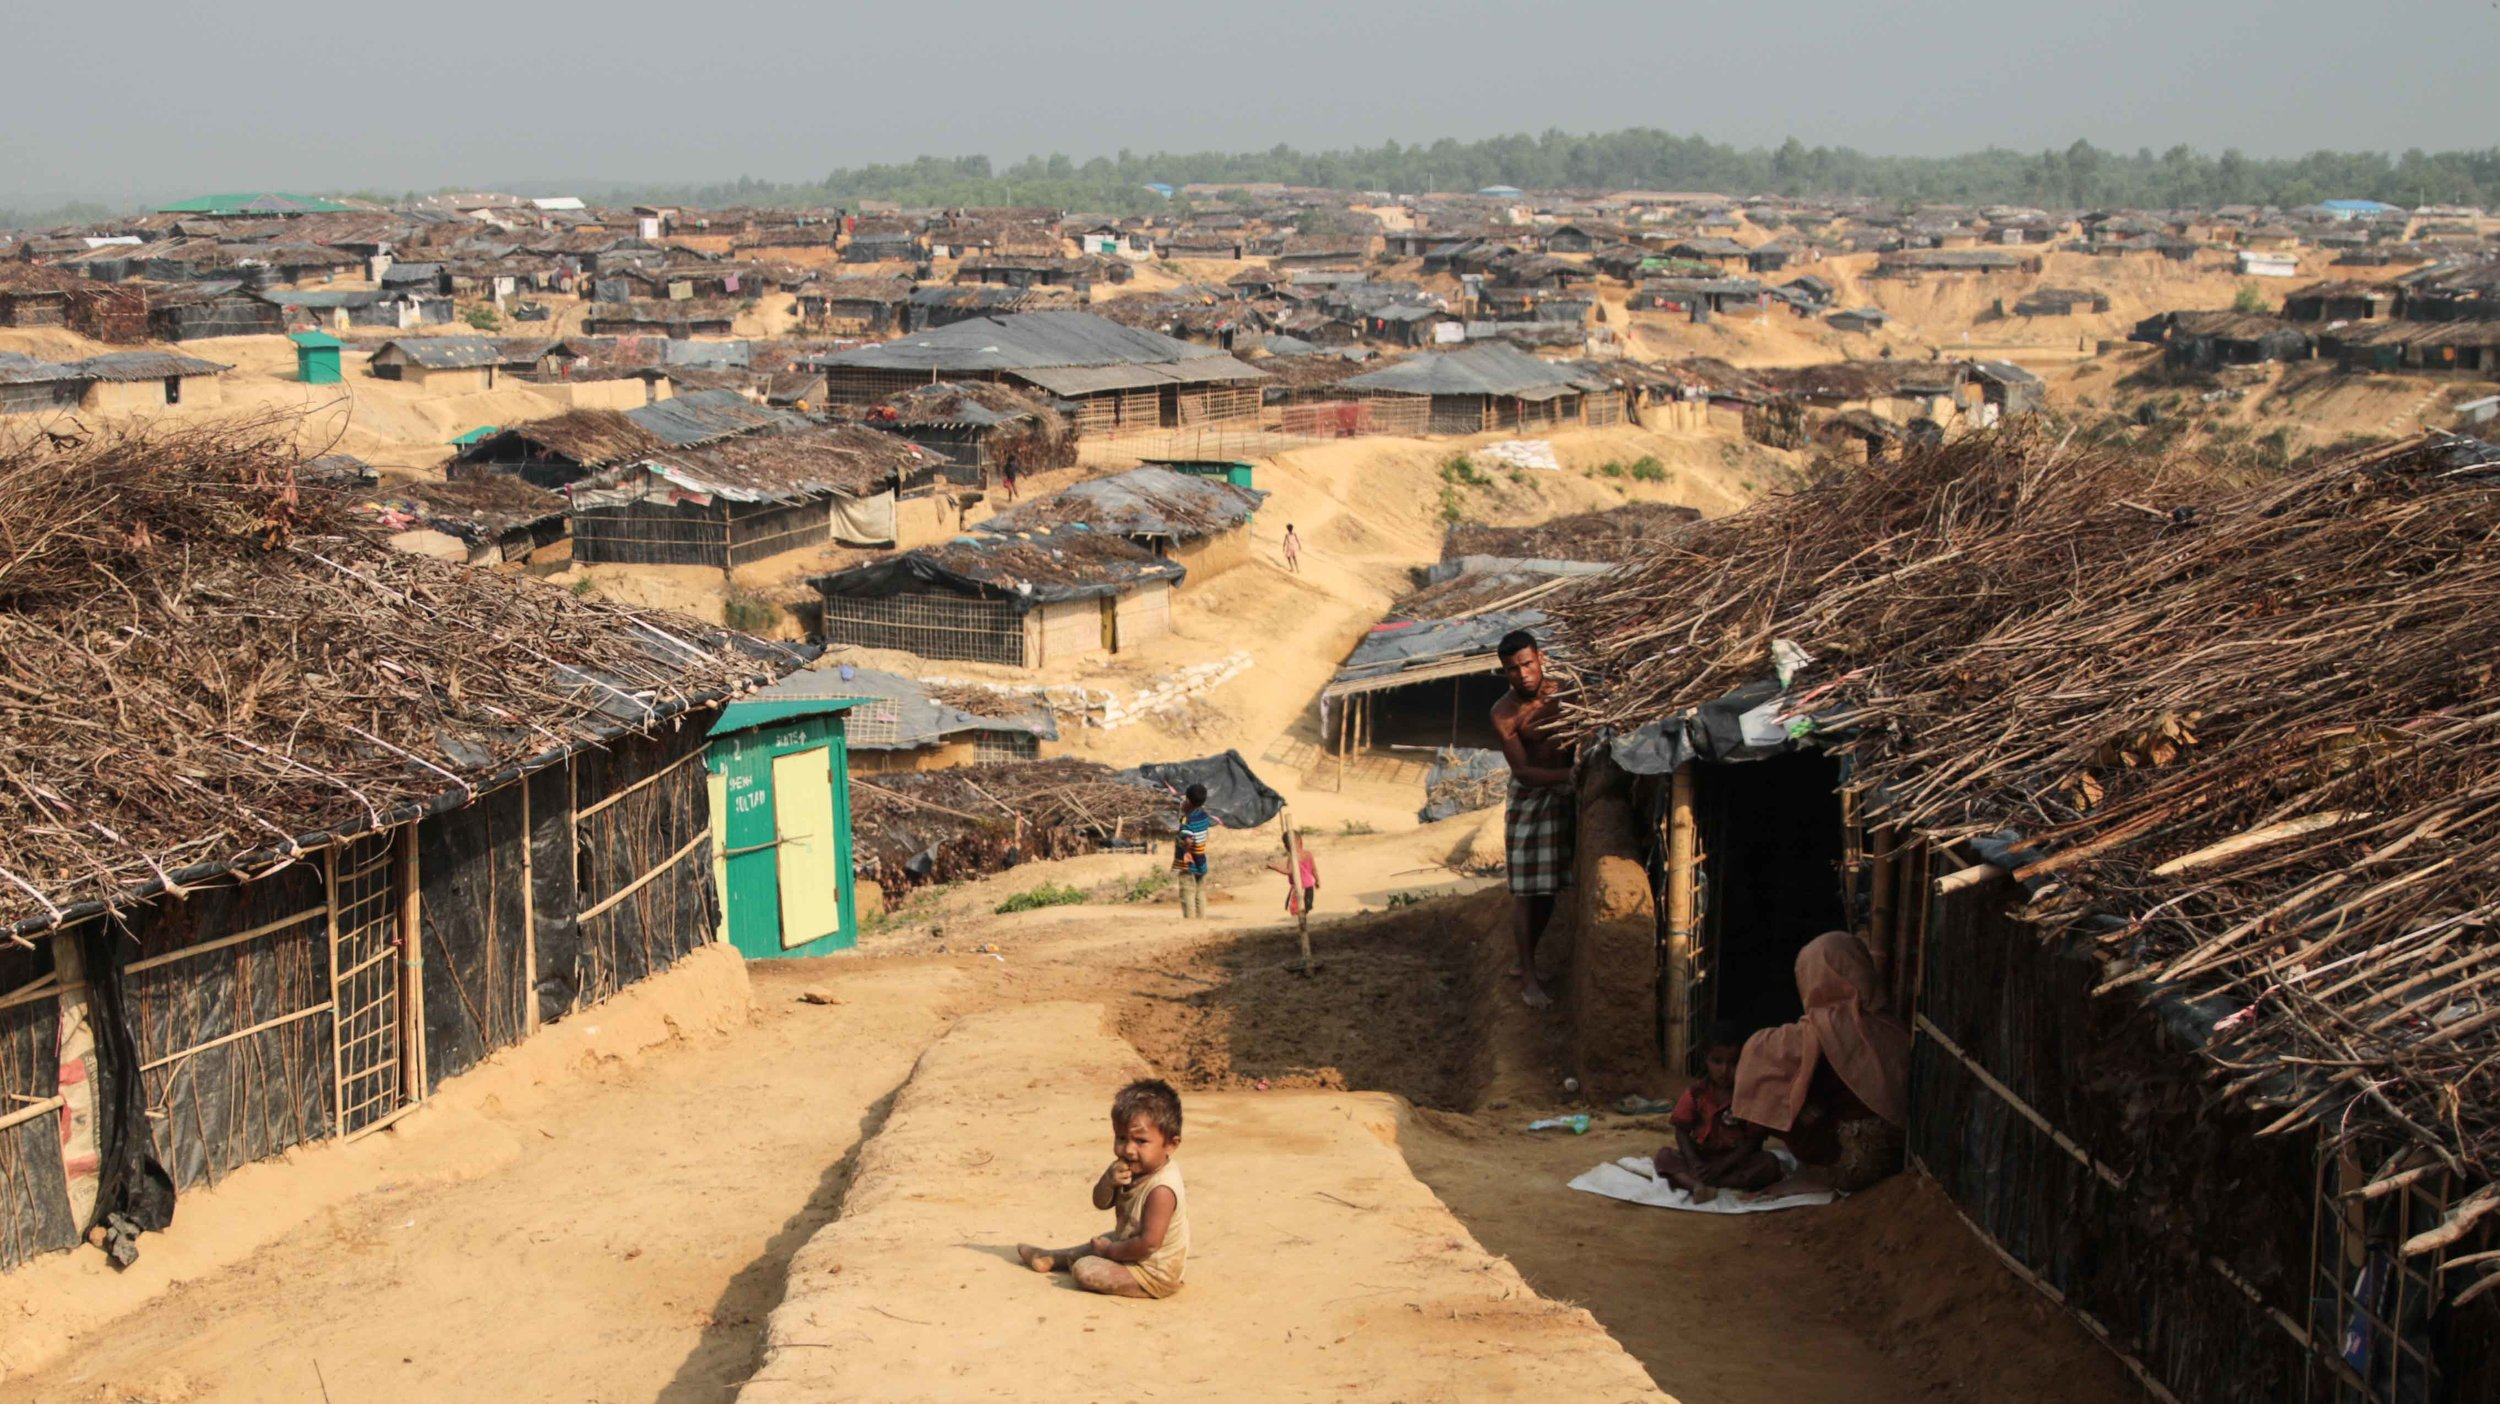 The Kutupalong refugee camp in Bangladesh, inhabited predominantly by Rohingya Muslims ( source )